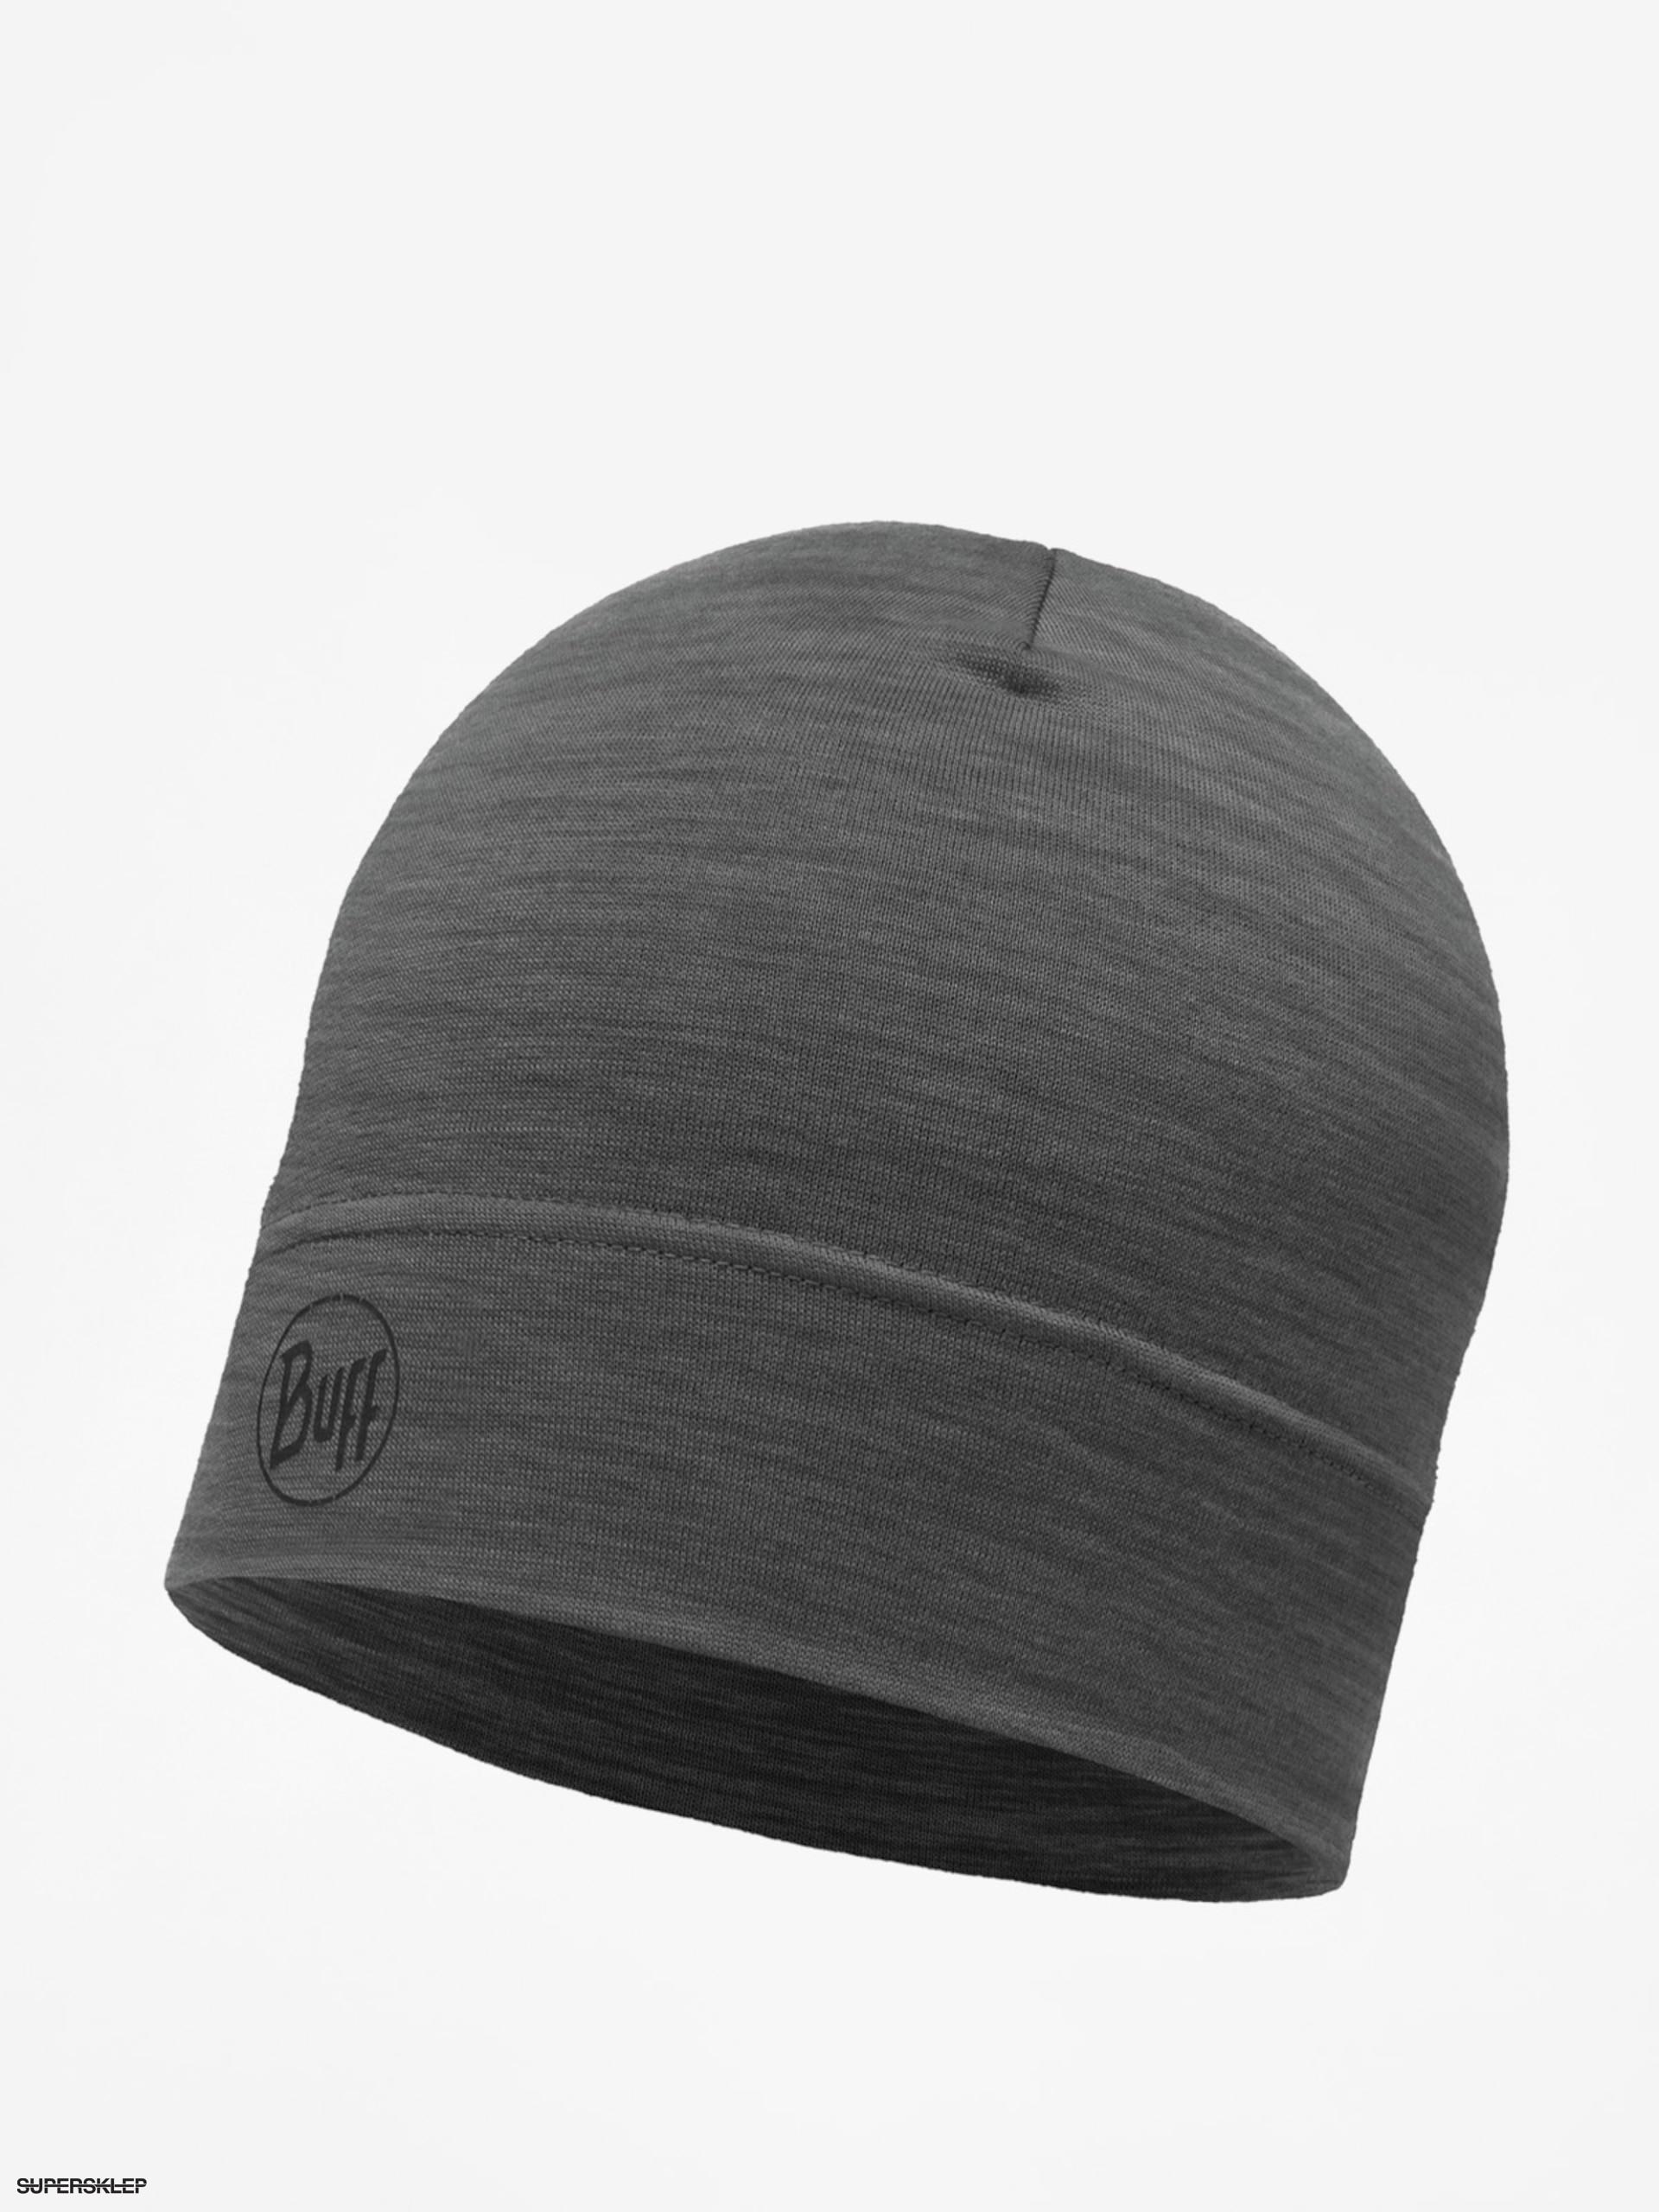 83e657c19 Čiapka Buff Lw Merino Wool (solid grey)